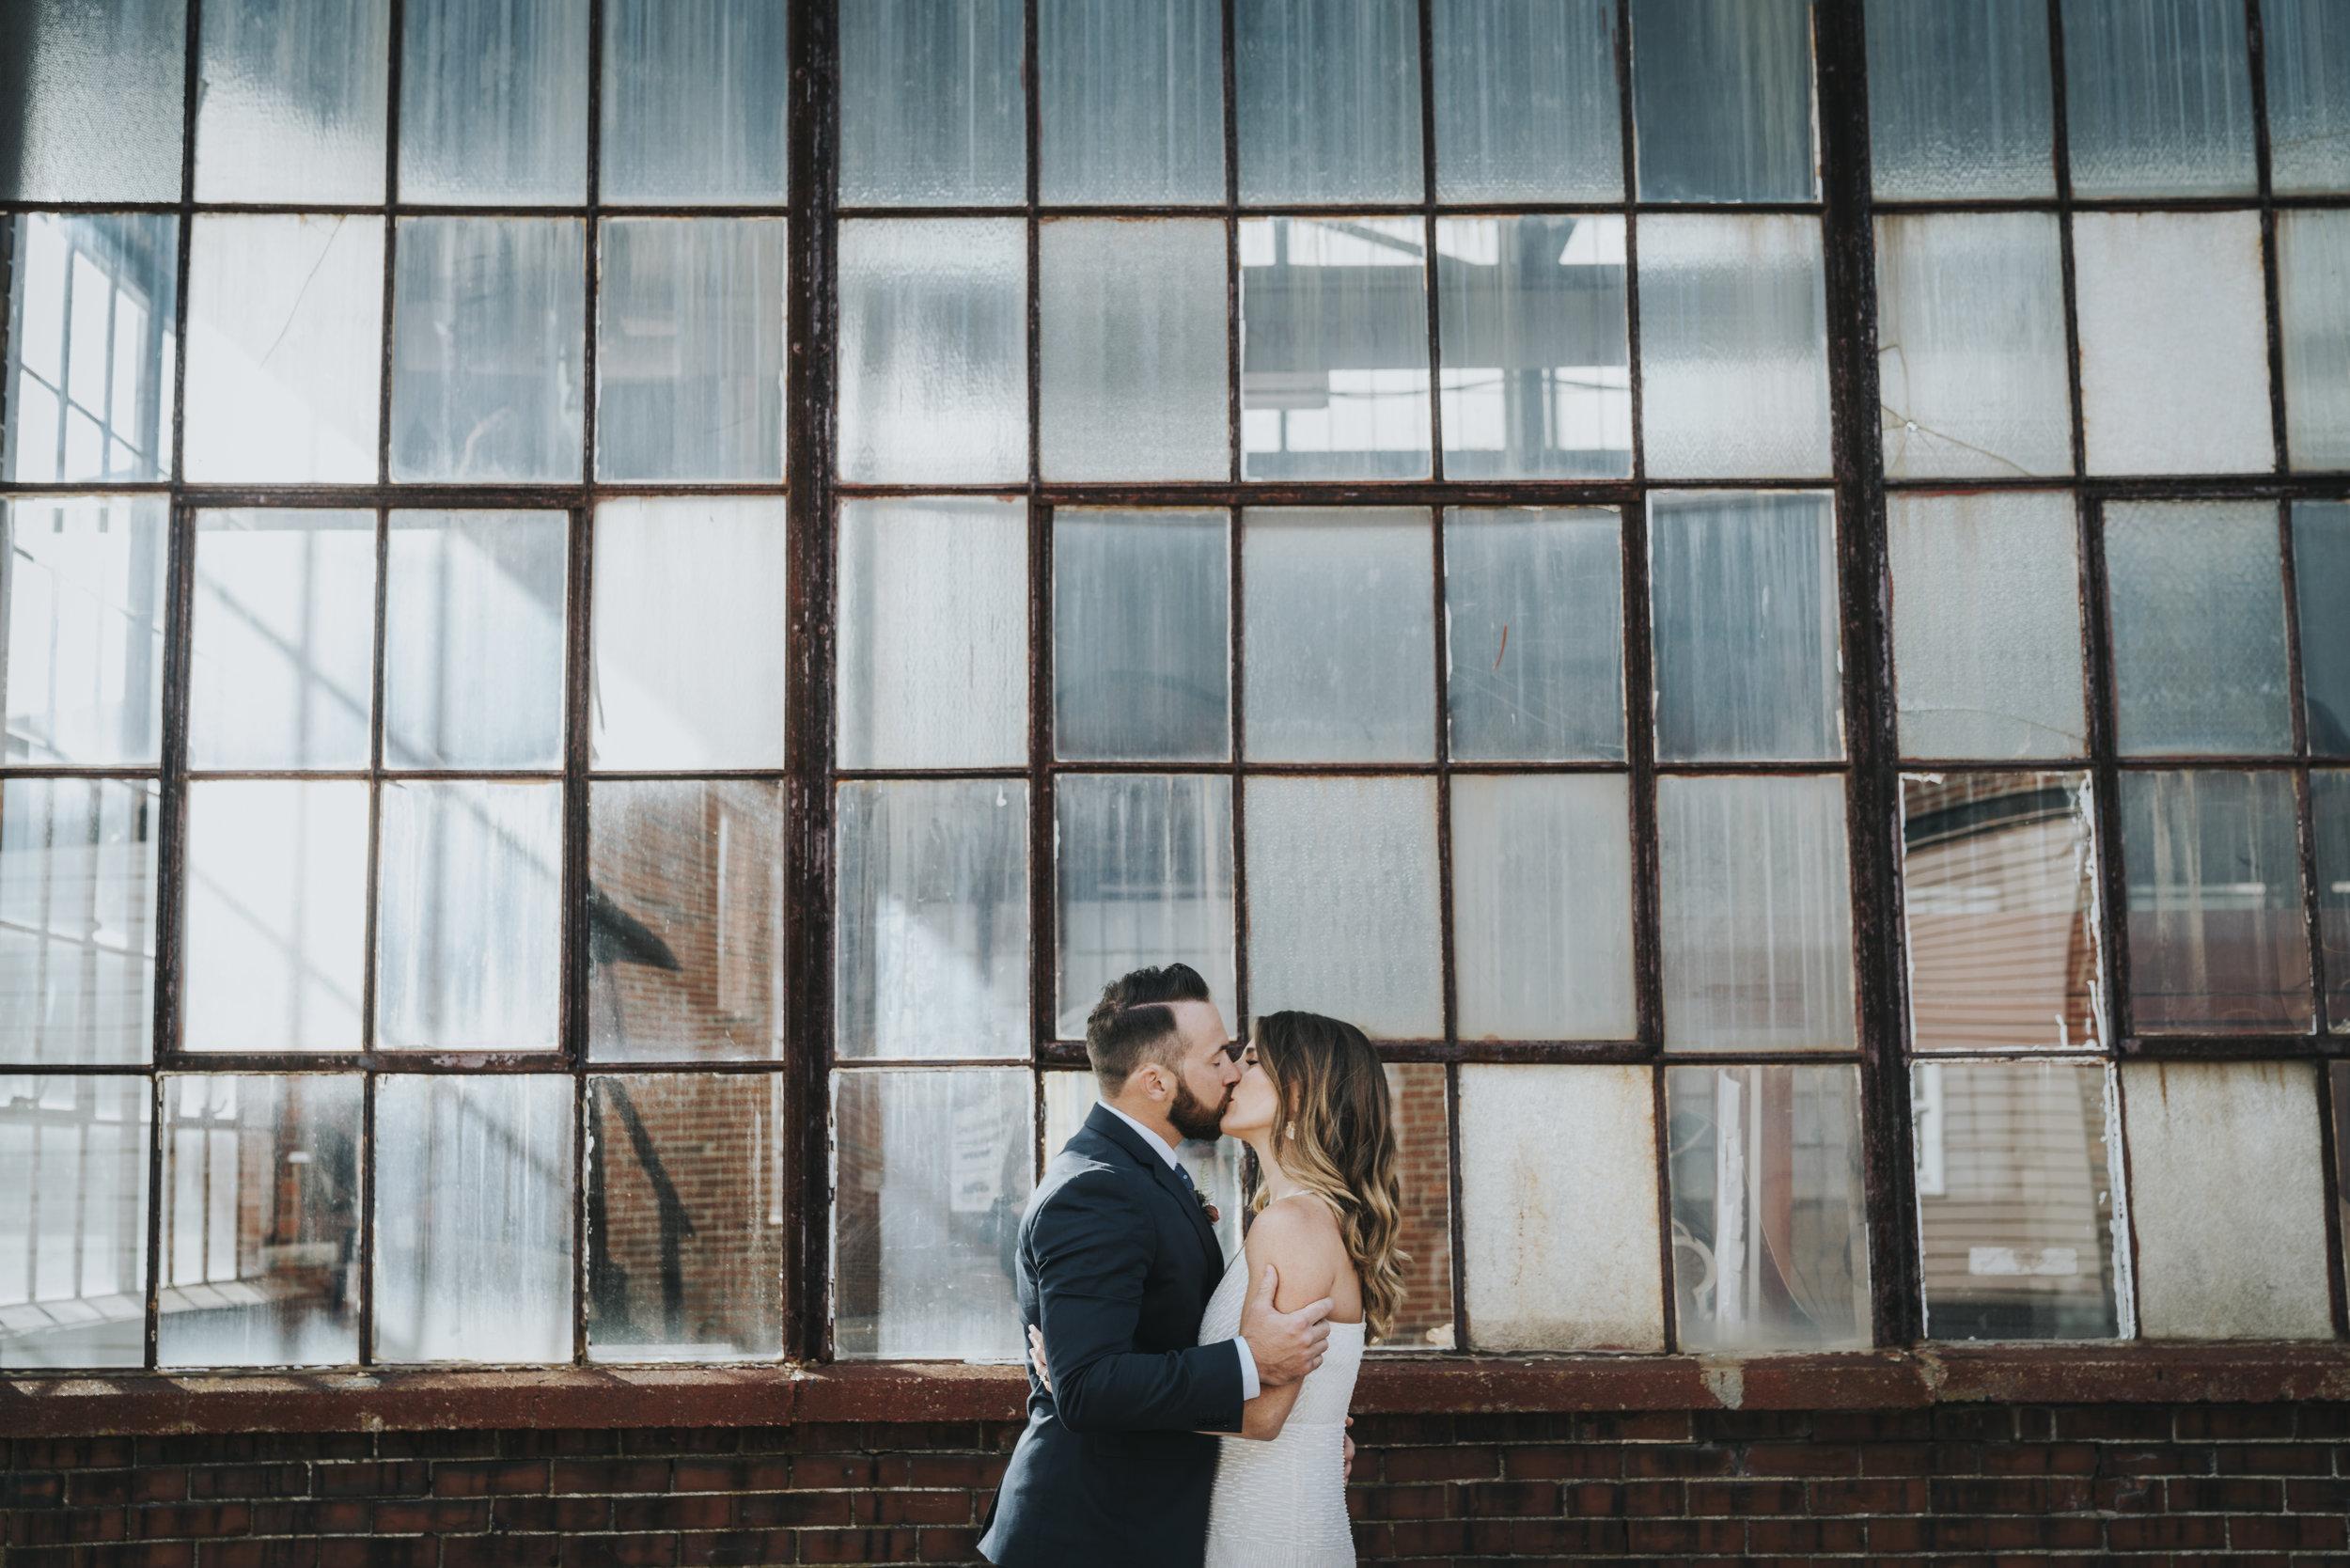 Wedding2017_Kyle&Maria_C3_5.28.17_JPGs (129 of 285).jpg